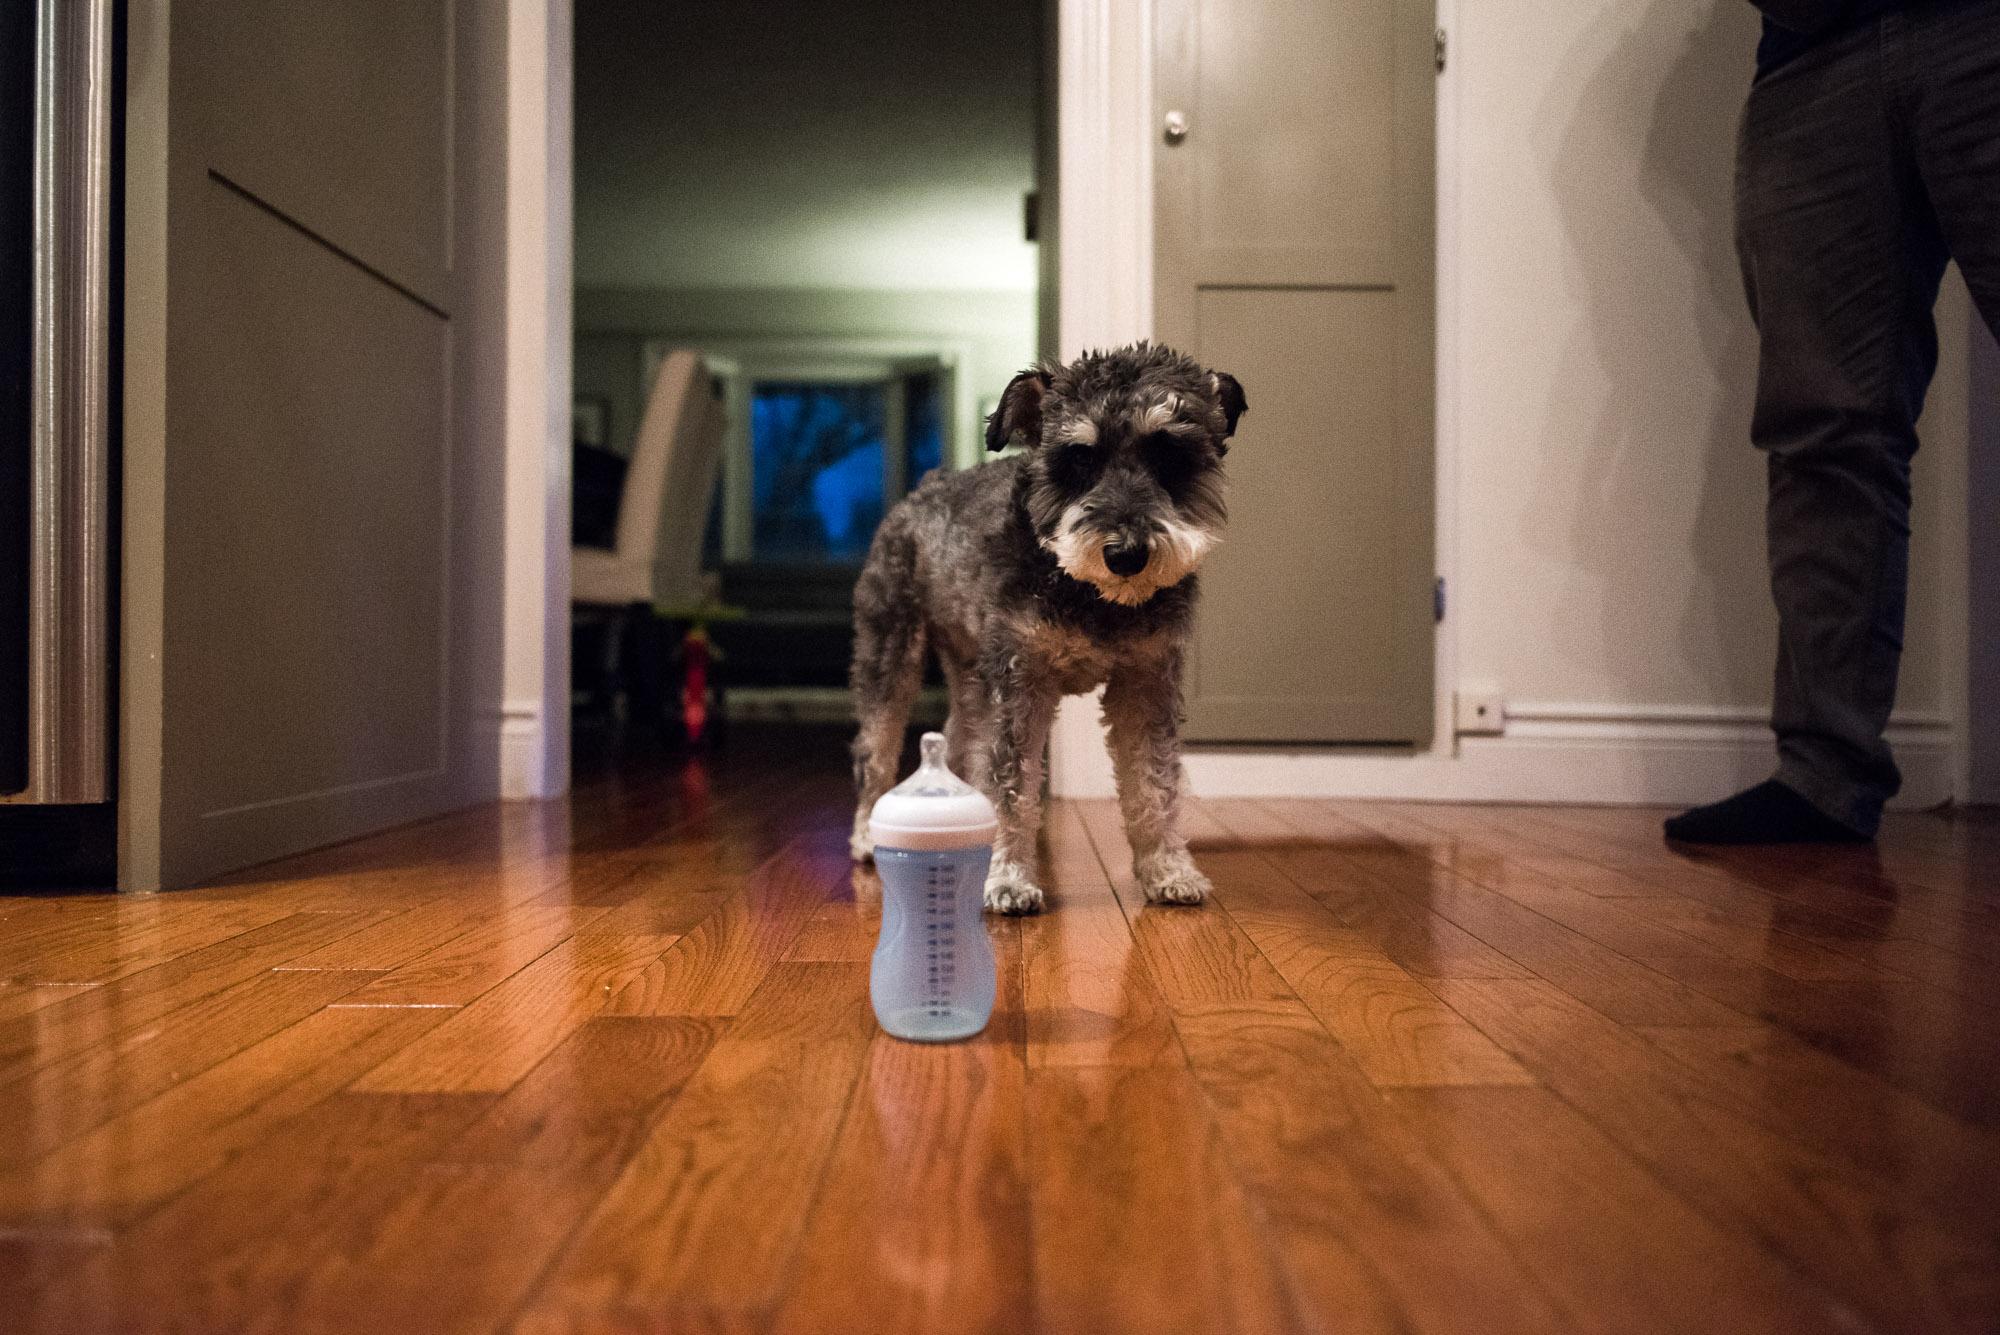 dog looks at baby bottle on the kitchen floor